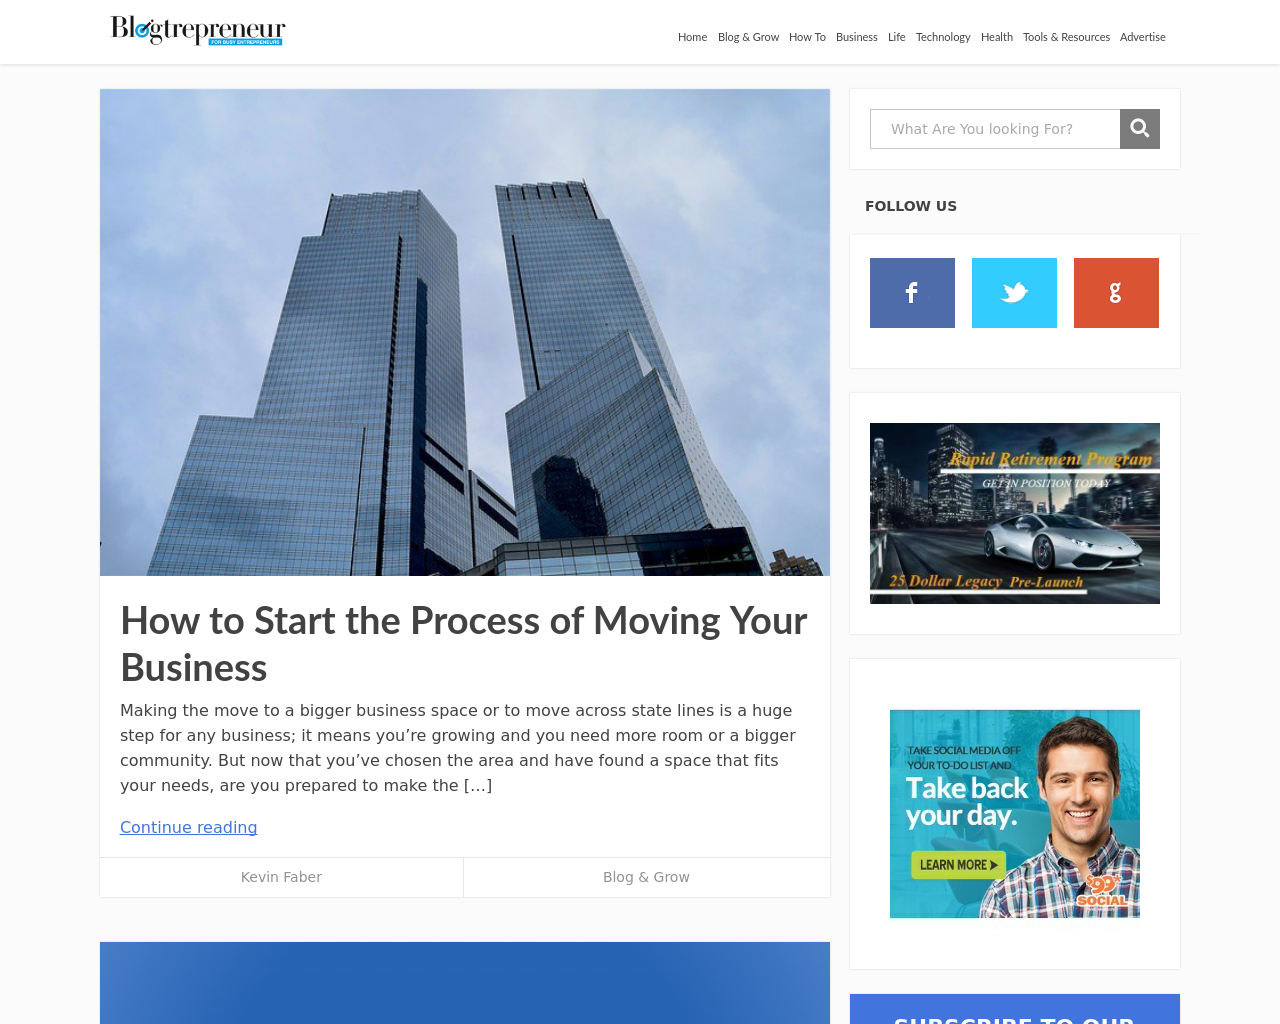 Blogtrepreneur-Advertising-Reviews-Pricing